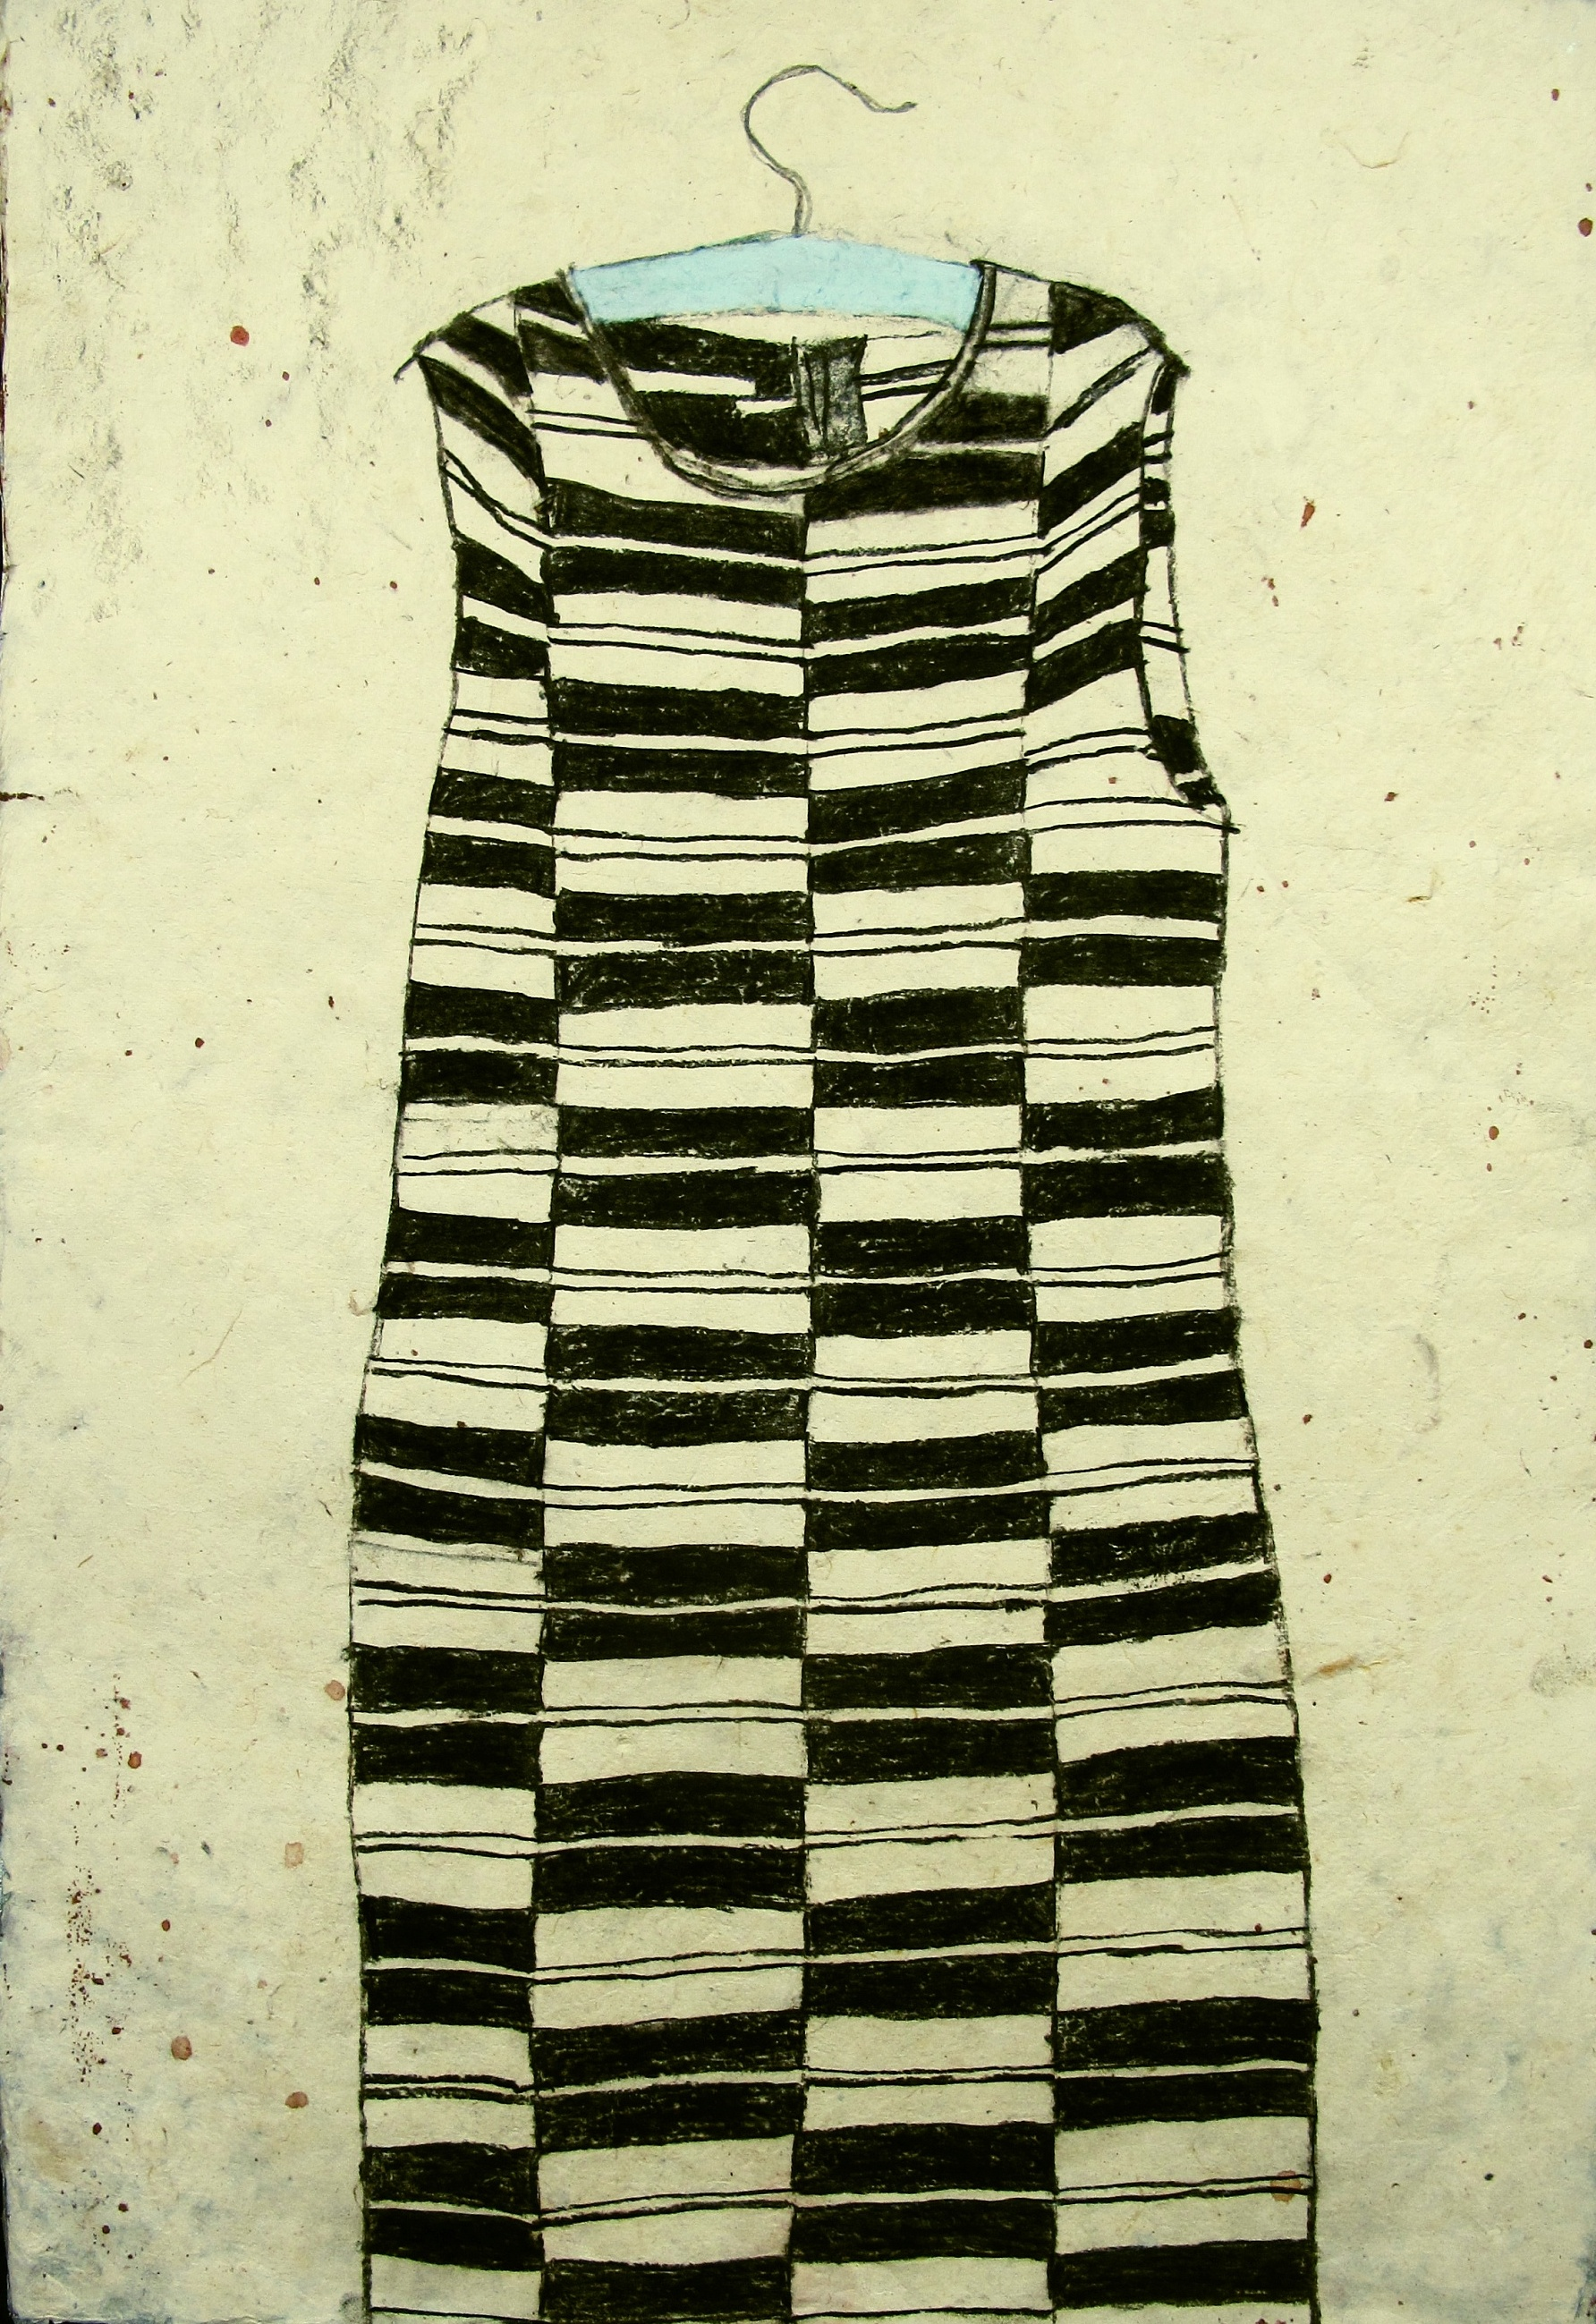 KE vintage dress